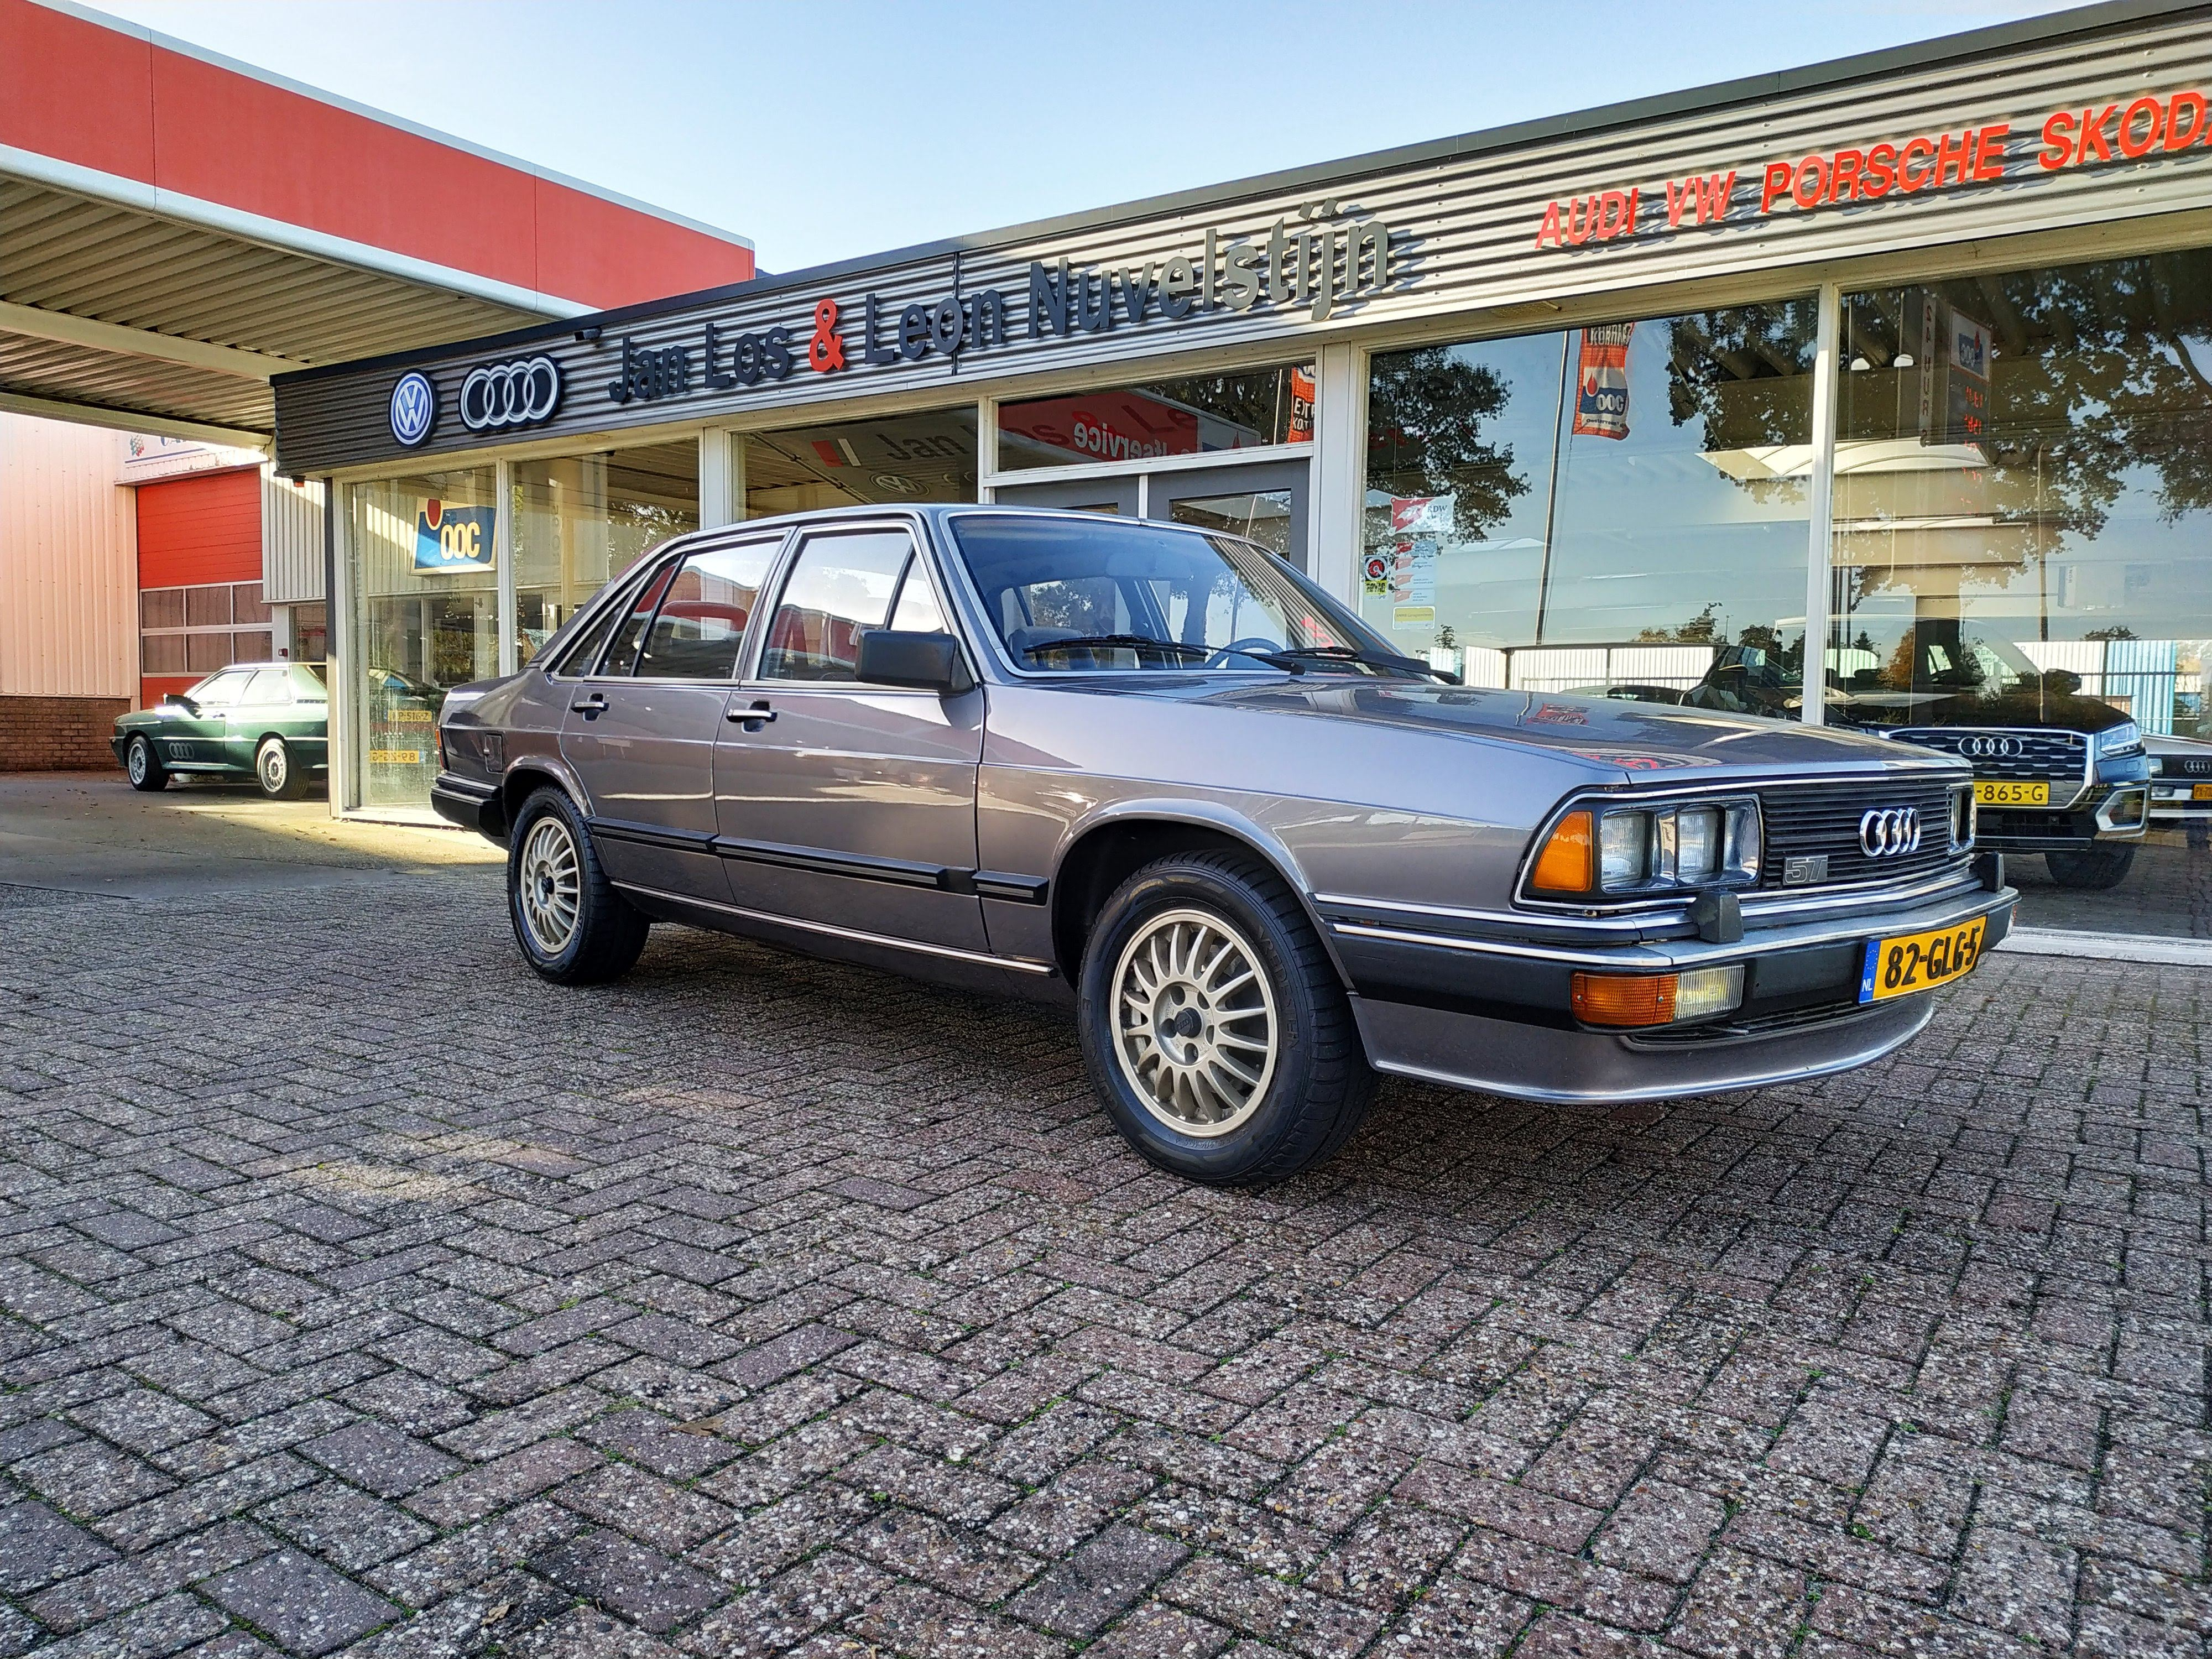 Audi 200 Turbo or 5000s review & testdrive by JMSpeedshop